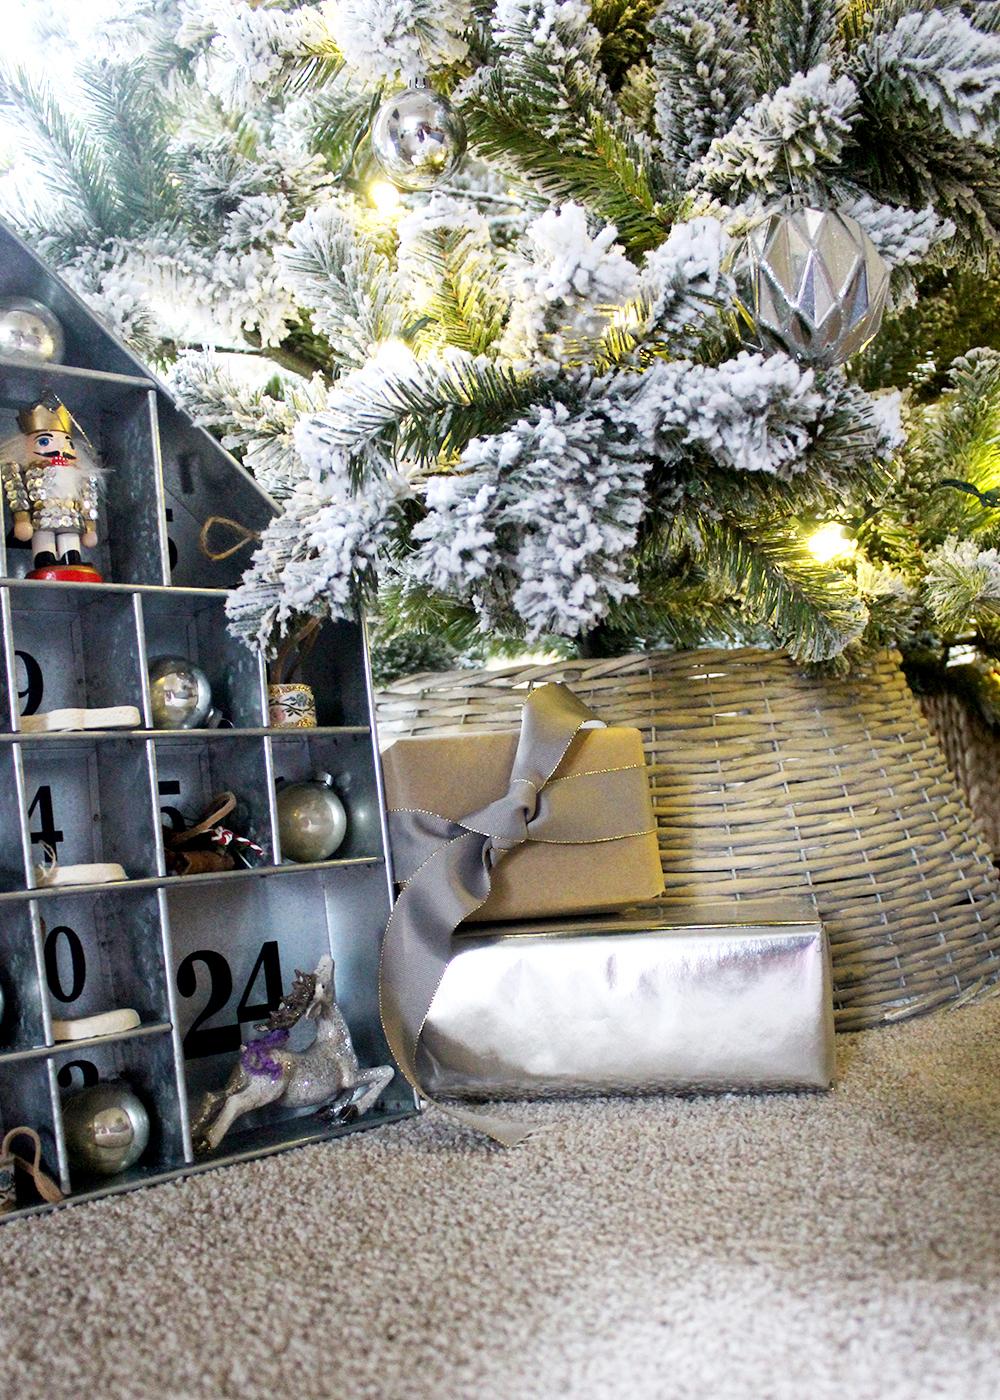 galvanized advent calendar under a flocked Christmas tree #ChristmasDecor #FlockedTree